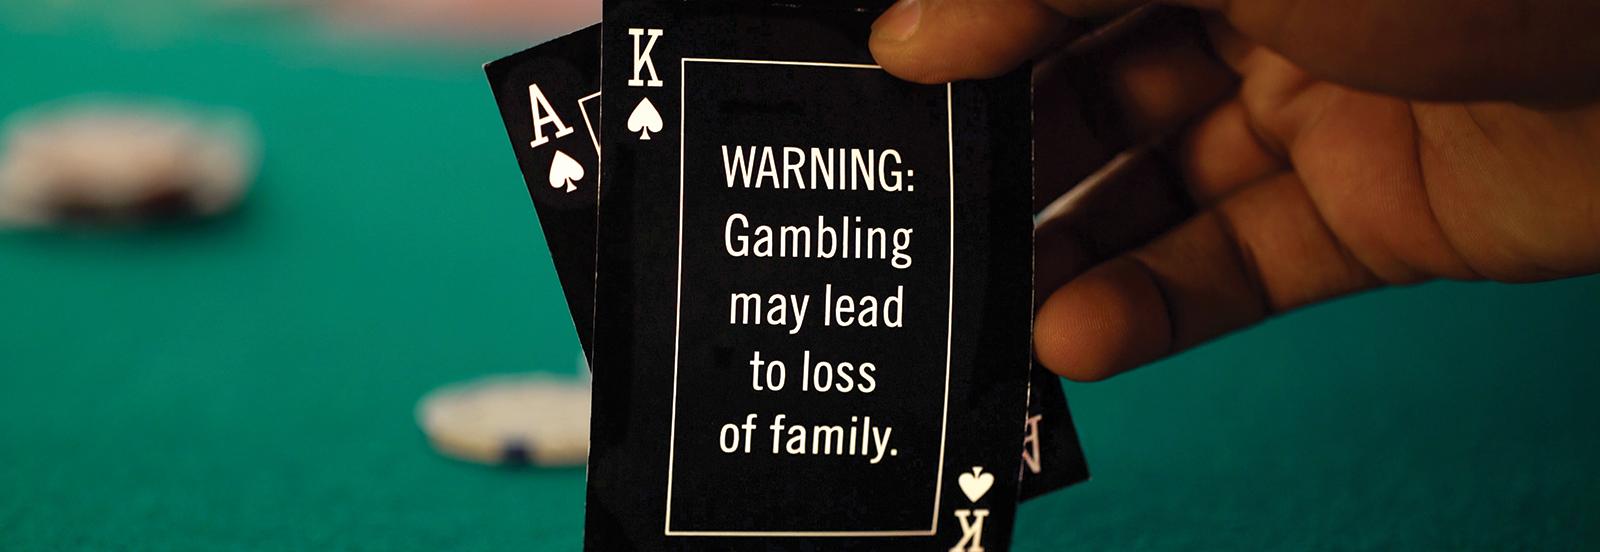 "poker card reads ""Warning: Gambling may lead to loss of family."""